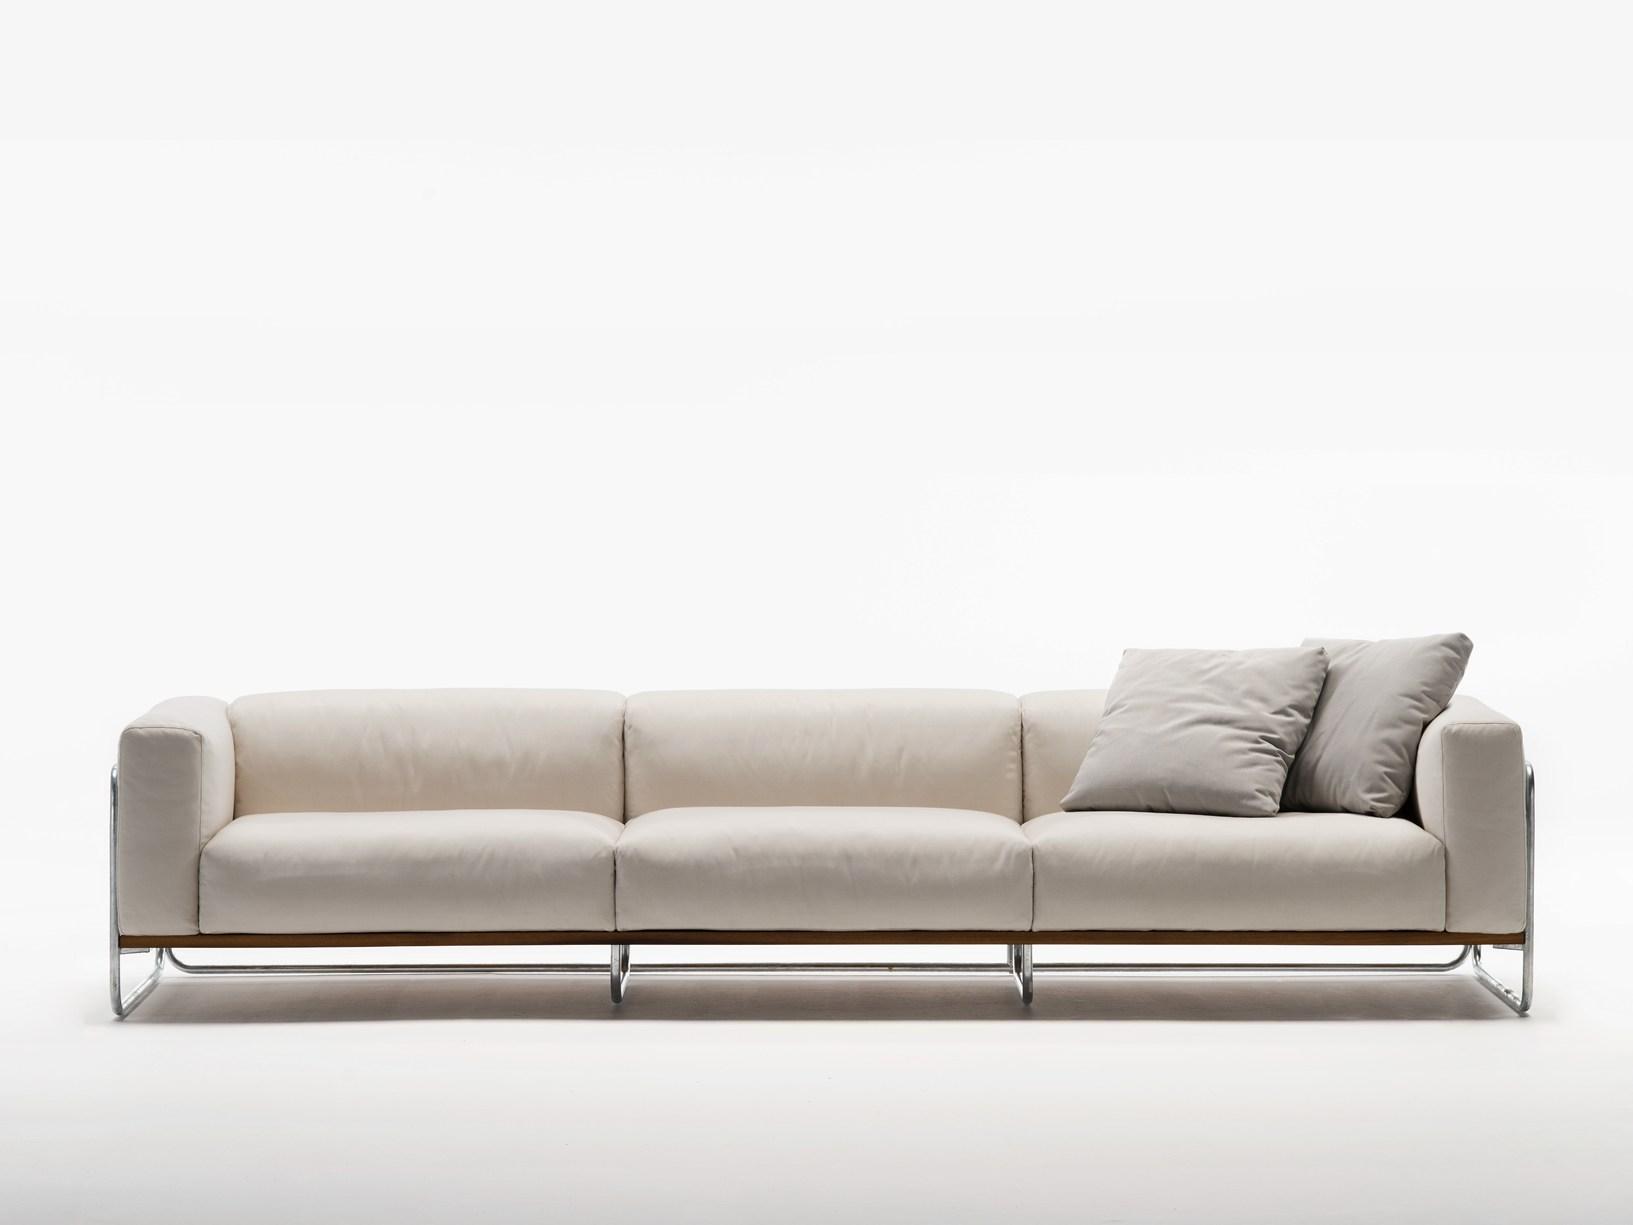 living divani protagonista al fuorisalone 2014. Black Bedroom Furniture Sets. Home Design Ideas